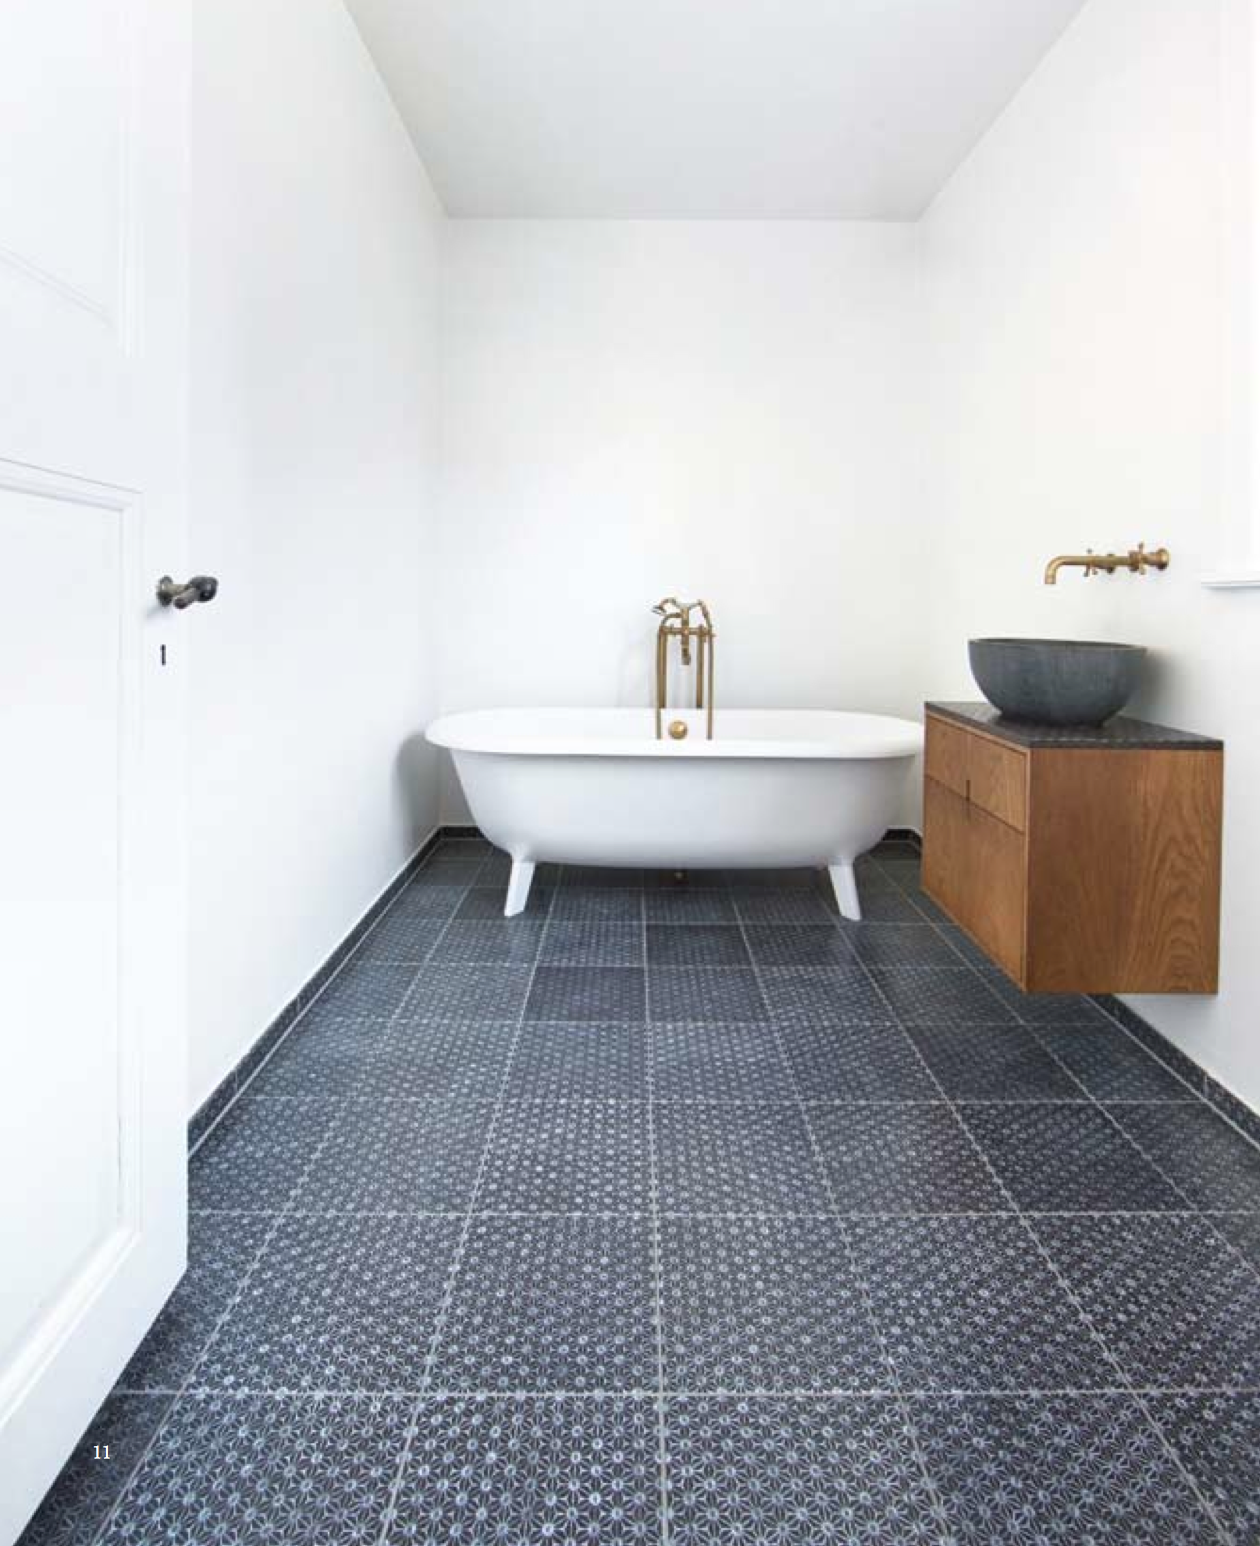 Tiles wunderkammer paris handmade lavastone ceramics terra cotta tiles wunderkammer paris handmade lavastone ceramics terra cotta carrelages made a mano salle de bains www dailygadgetfo Choice Image